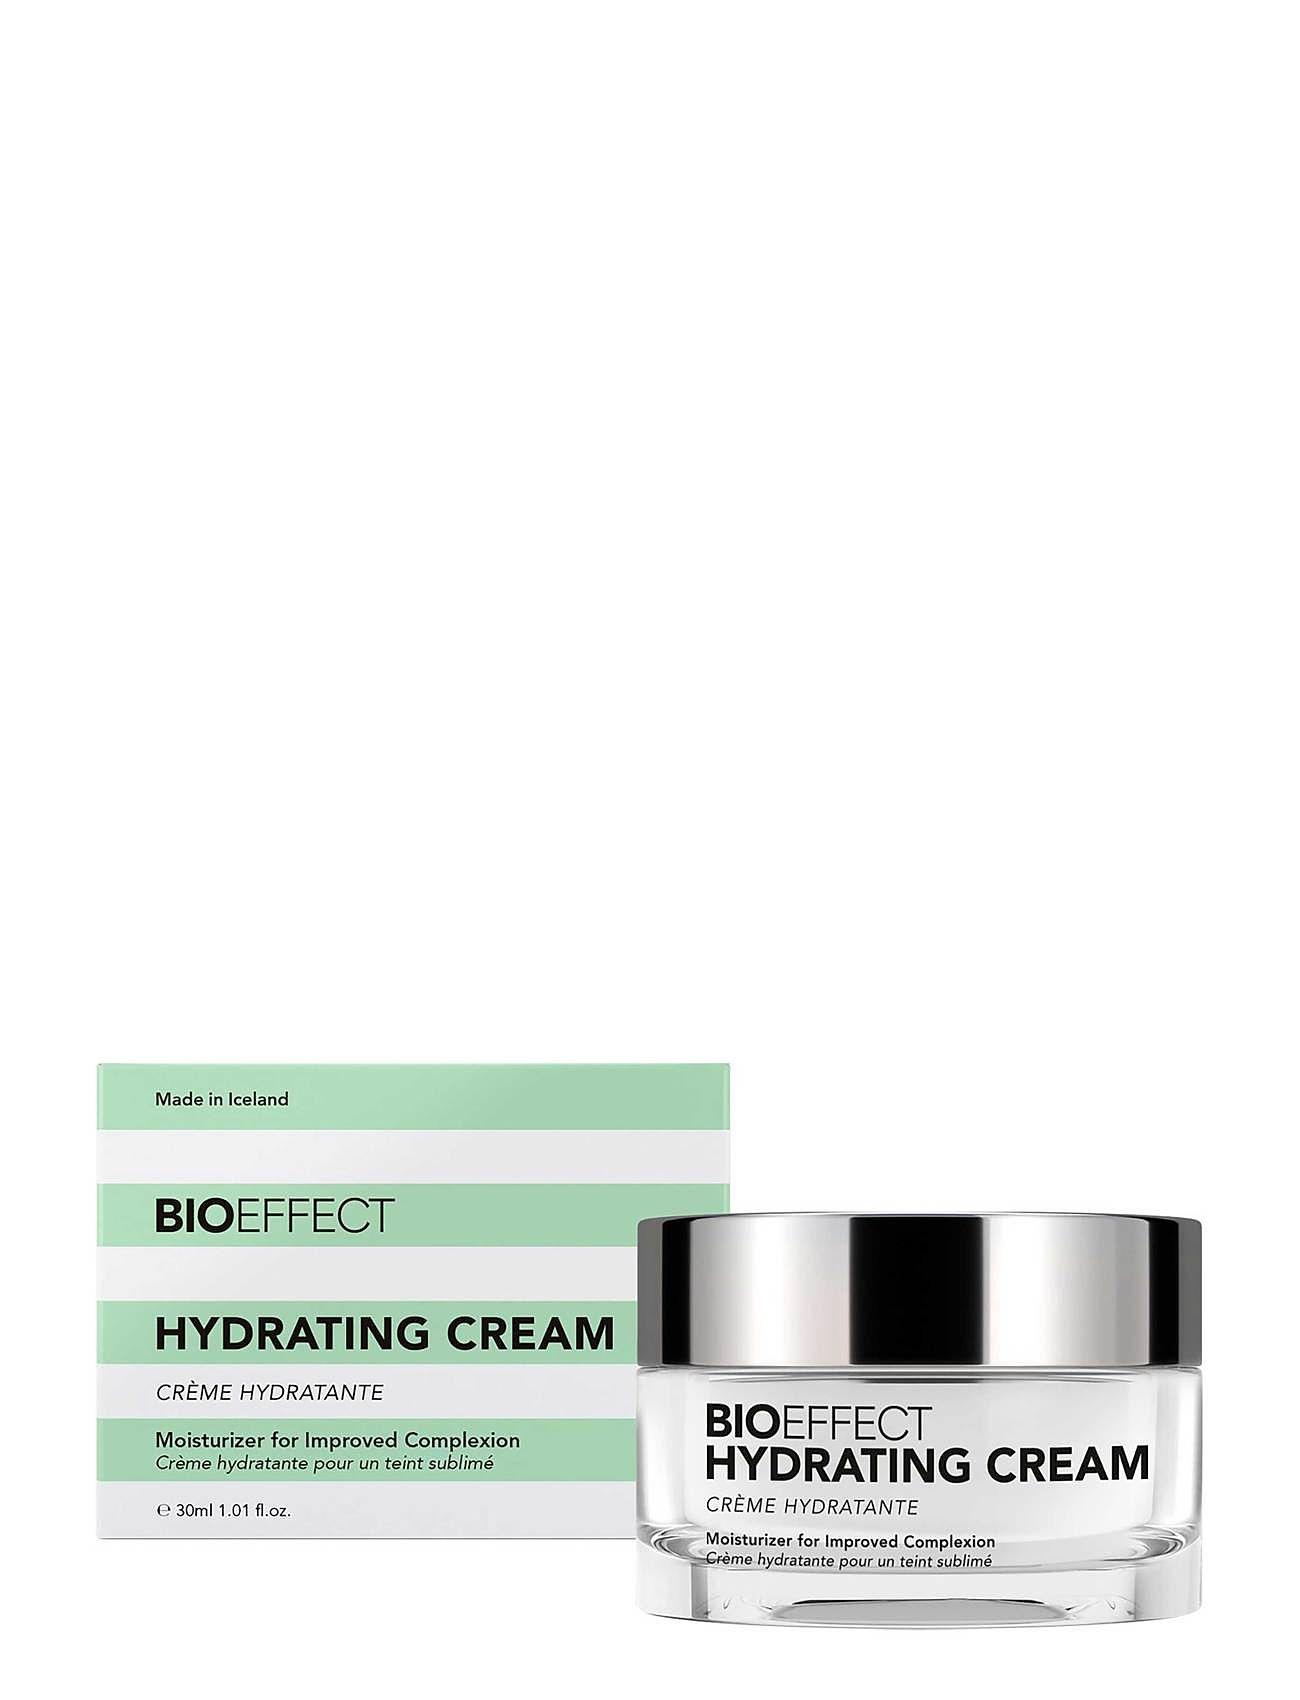 Hydrating Cream Beauty WOMEN Skin Care Face Day Creams Nude BIOEFFECT